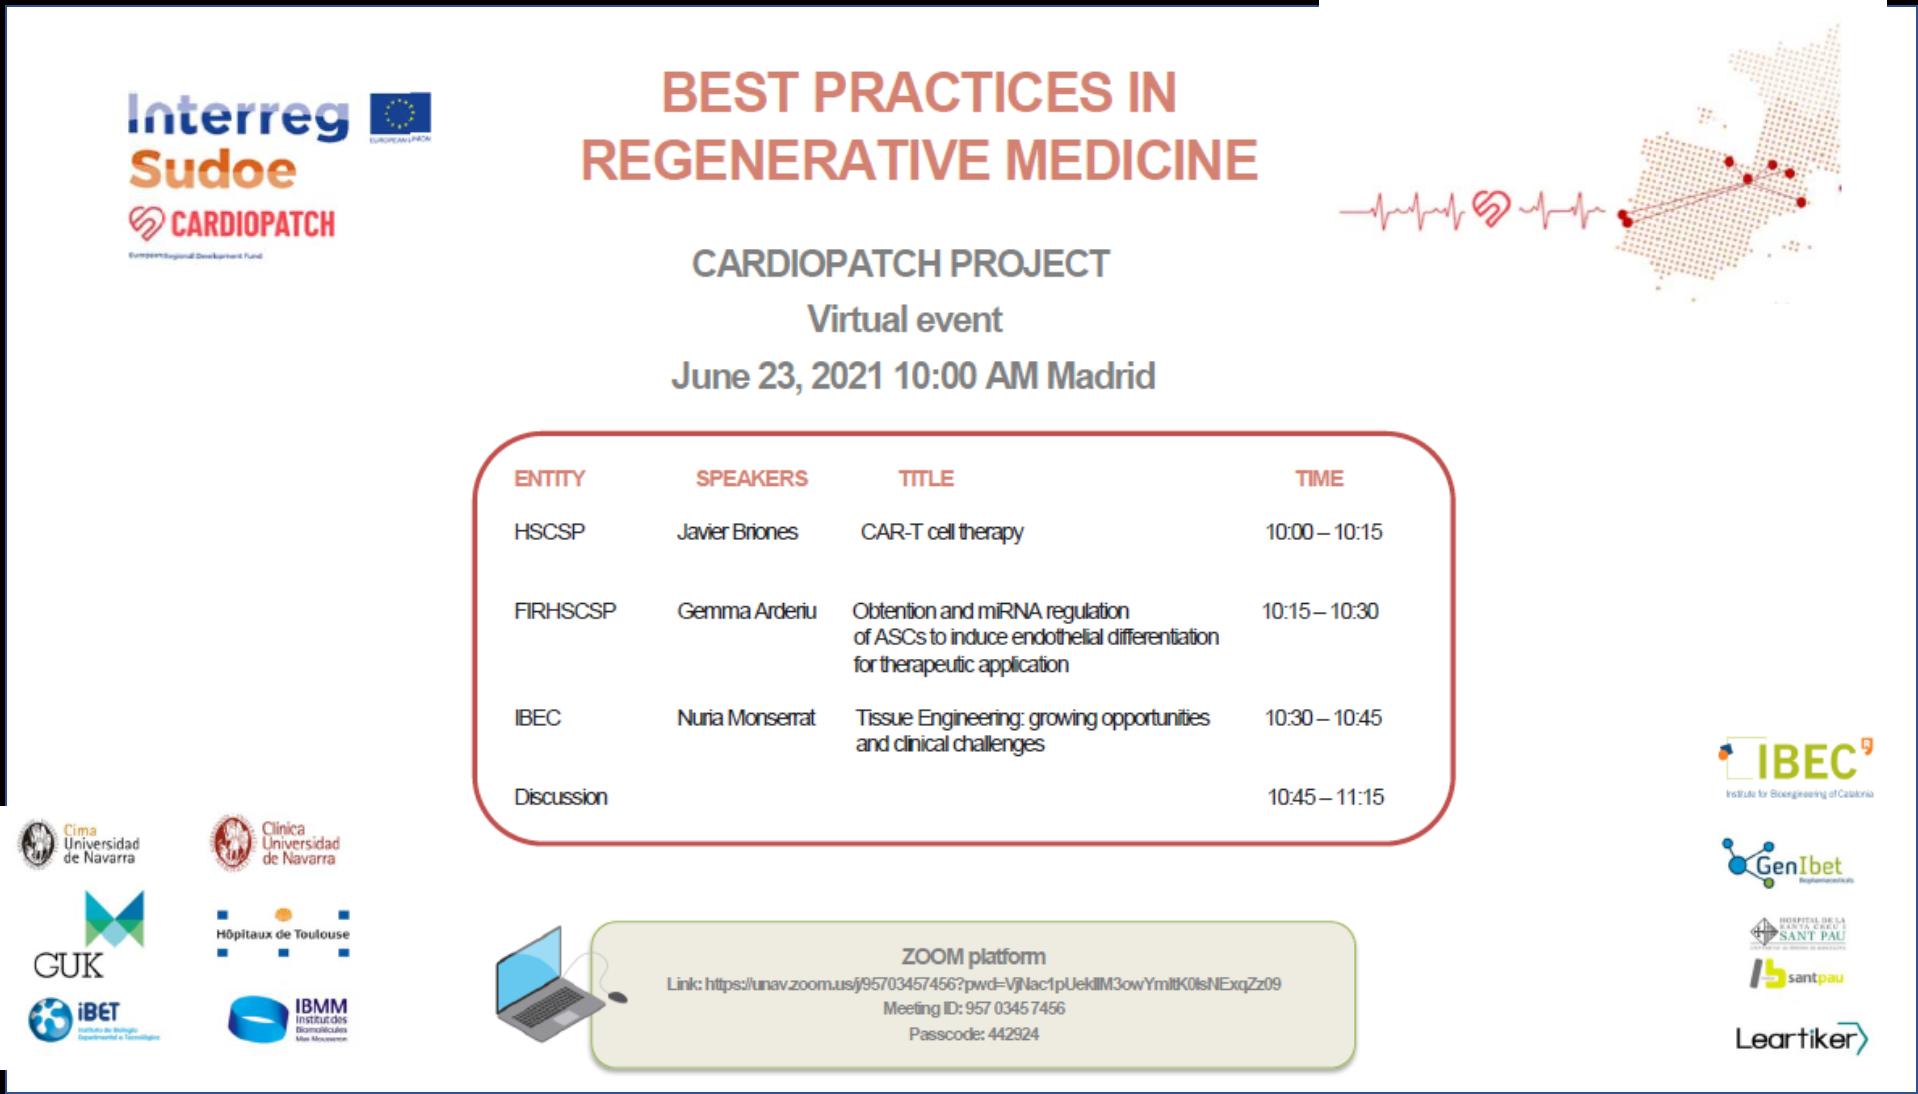 best practice in regenerative medecine 2021